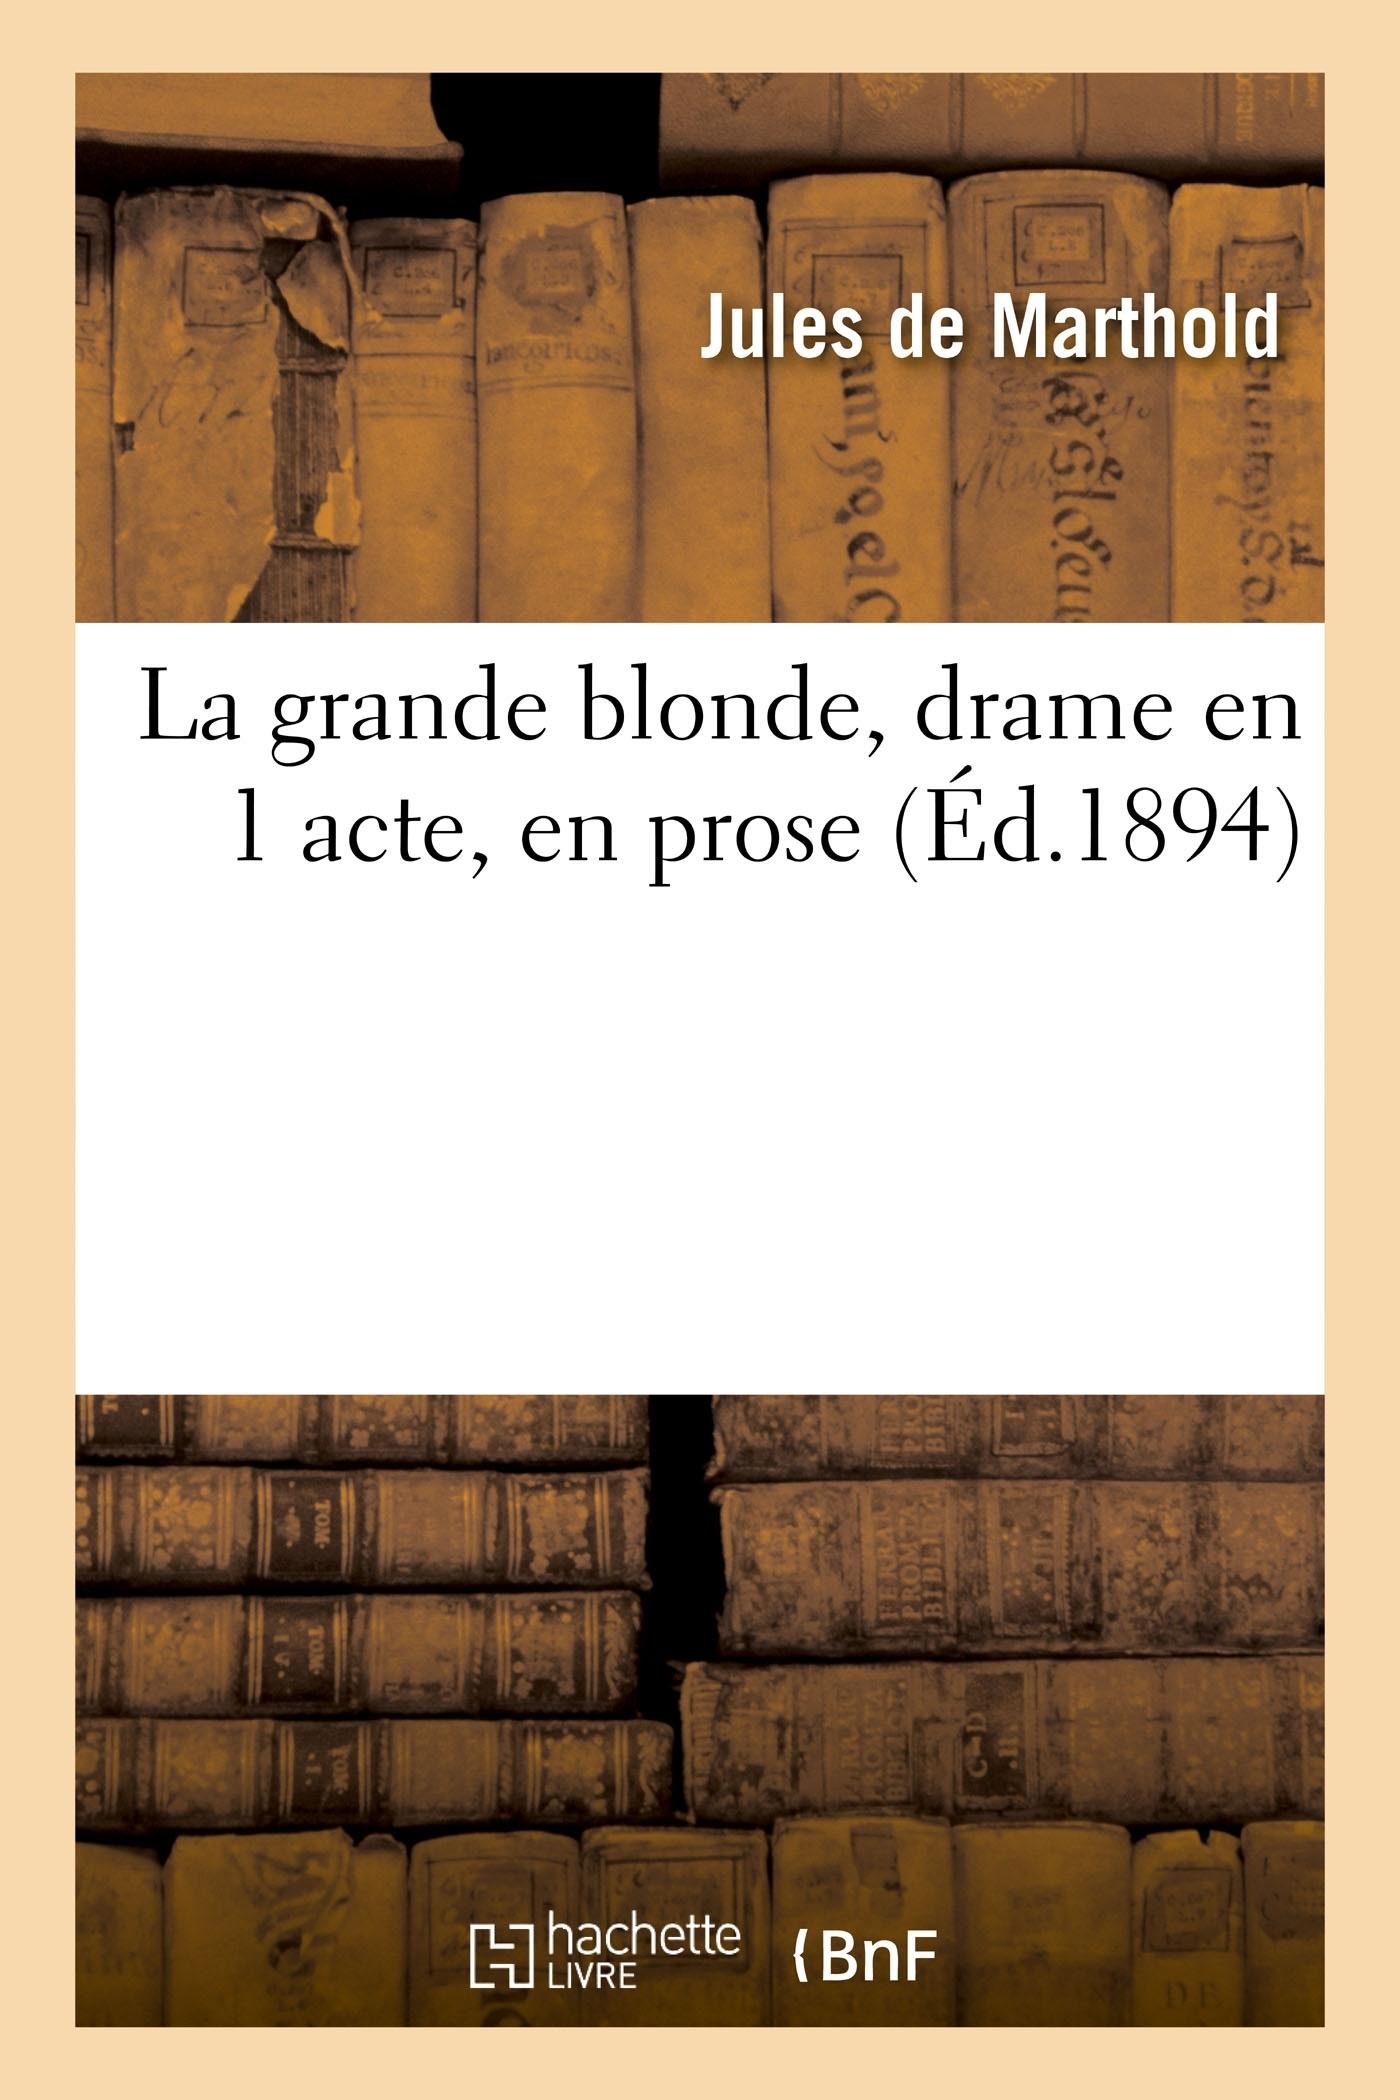 LA GRANDE BLONDE, DRAME EN 1 ACTE, EN PROSE